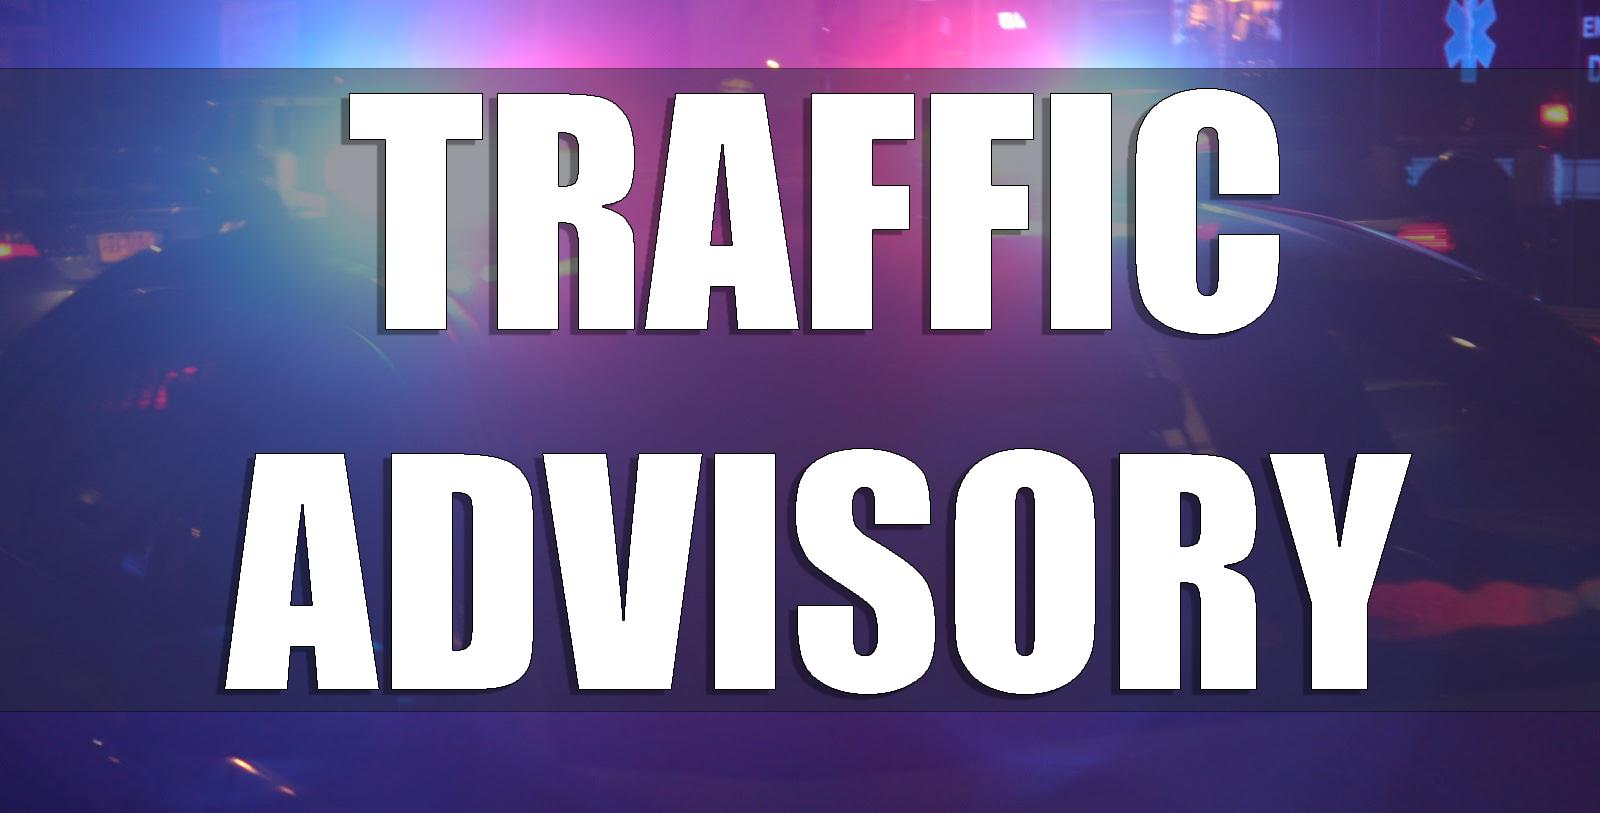 Traffic restrictions for PM Modi